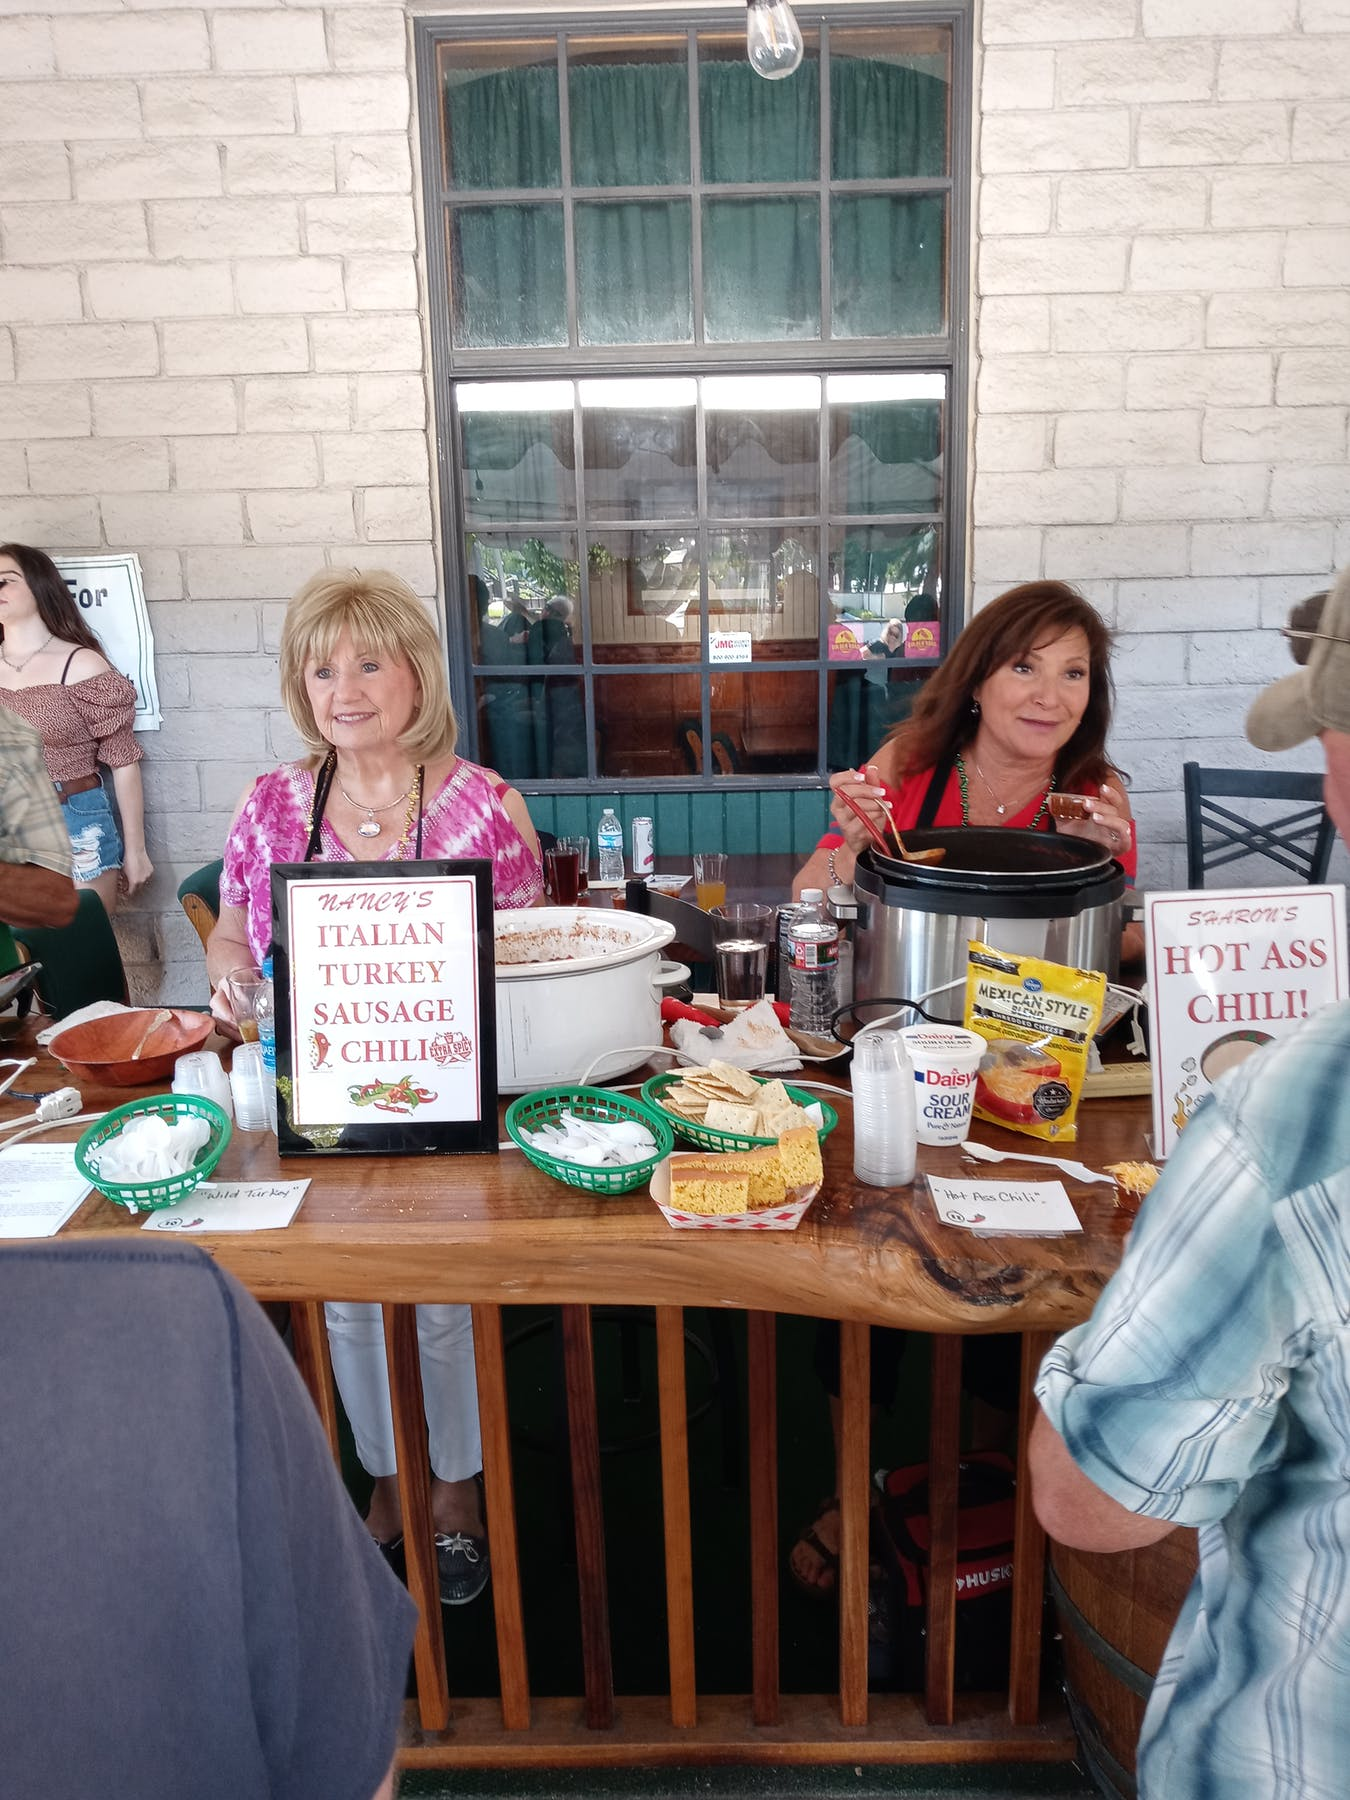 Judy Finnigan et al. sitting at a table in a restaurant